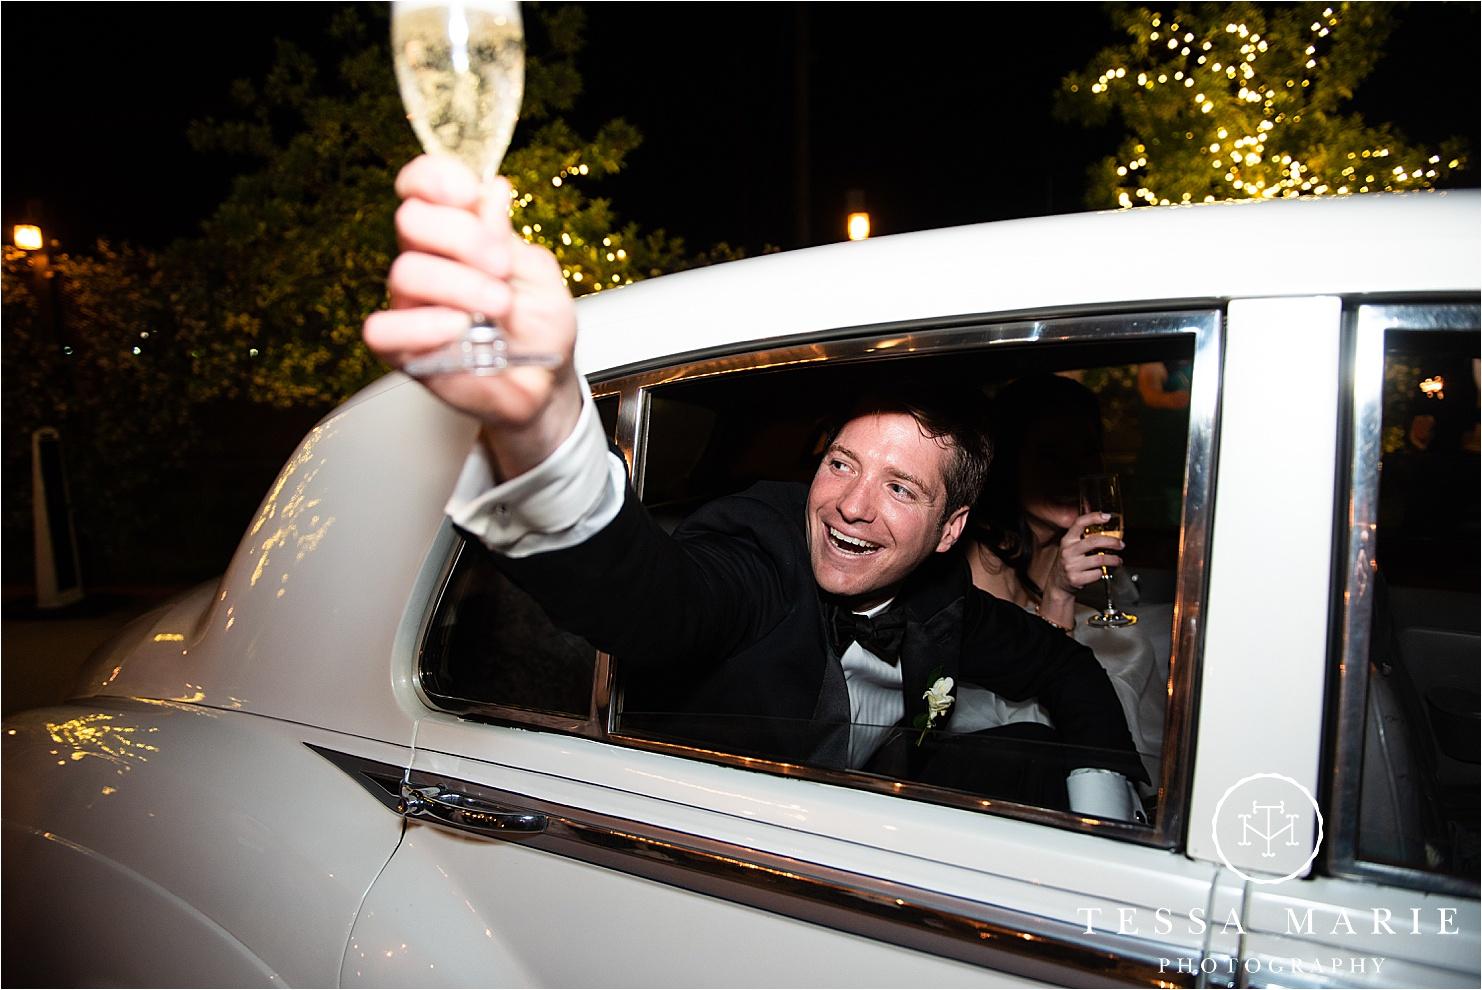 Tessa_marie_weddings_houston_wedding_photographer_The_astorian_0190.jpg